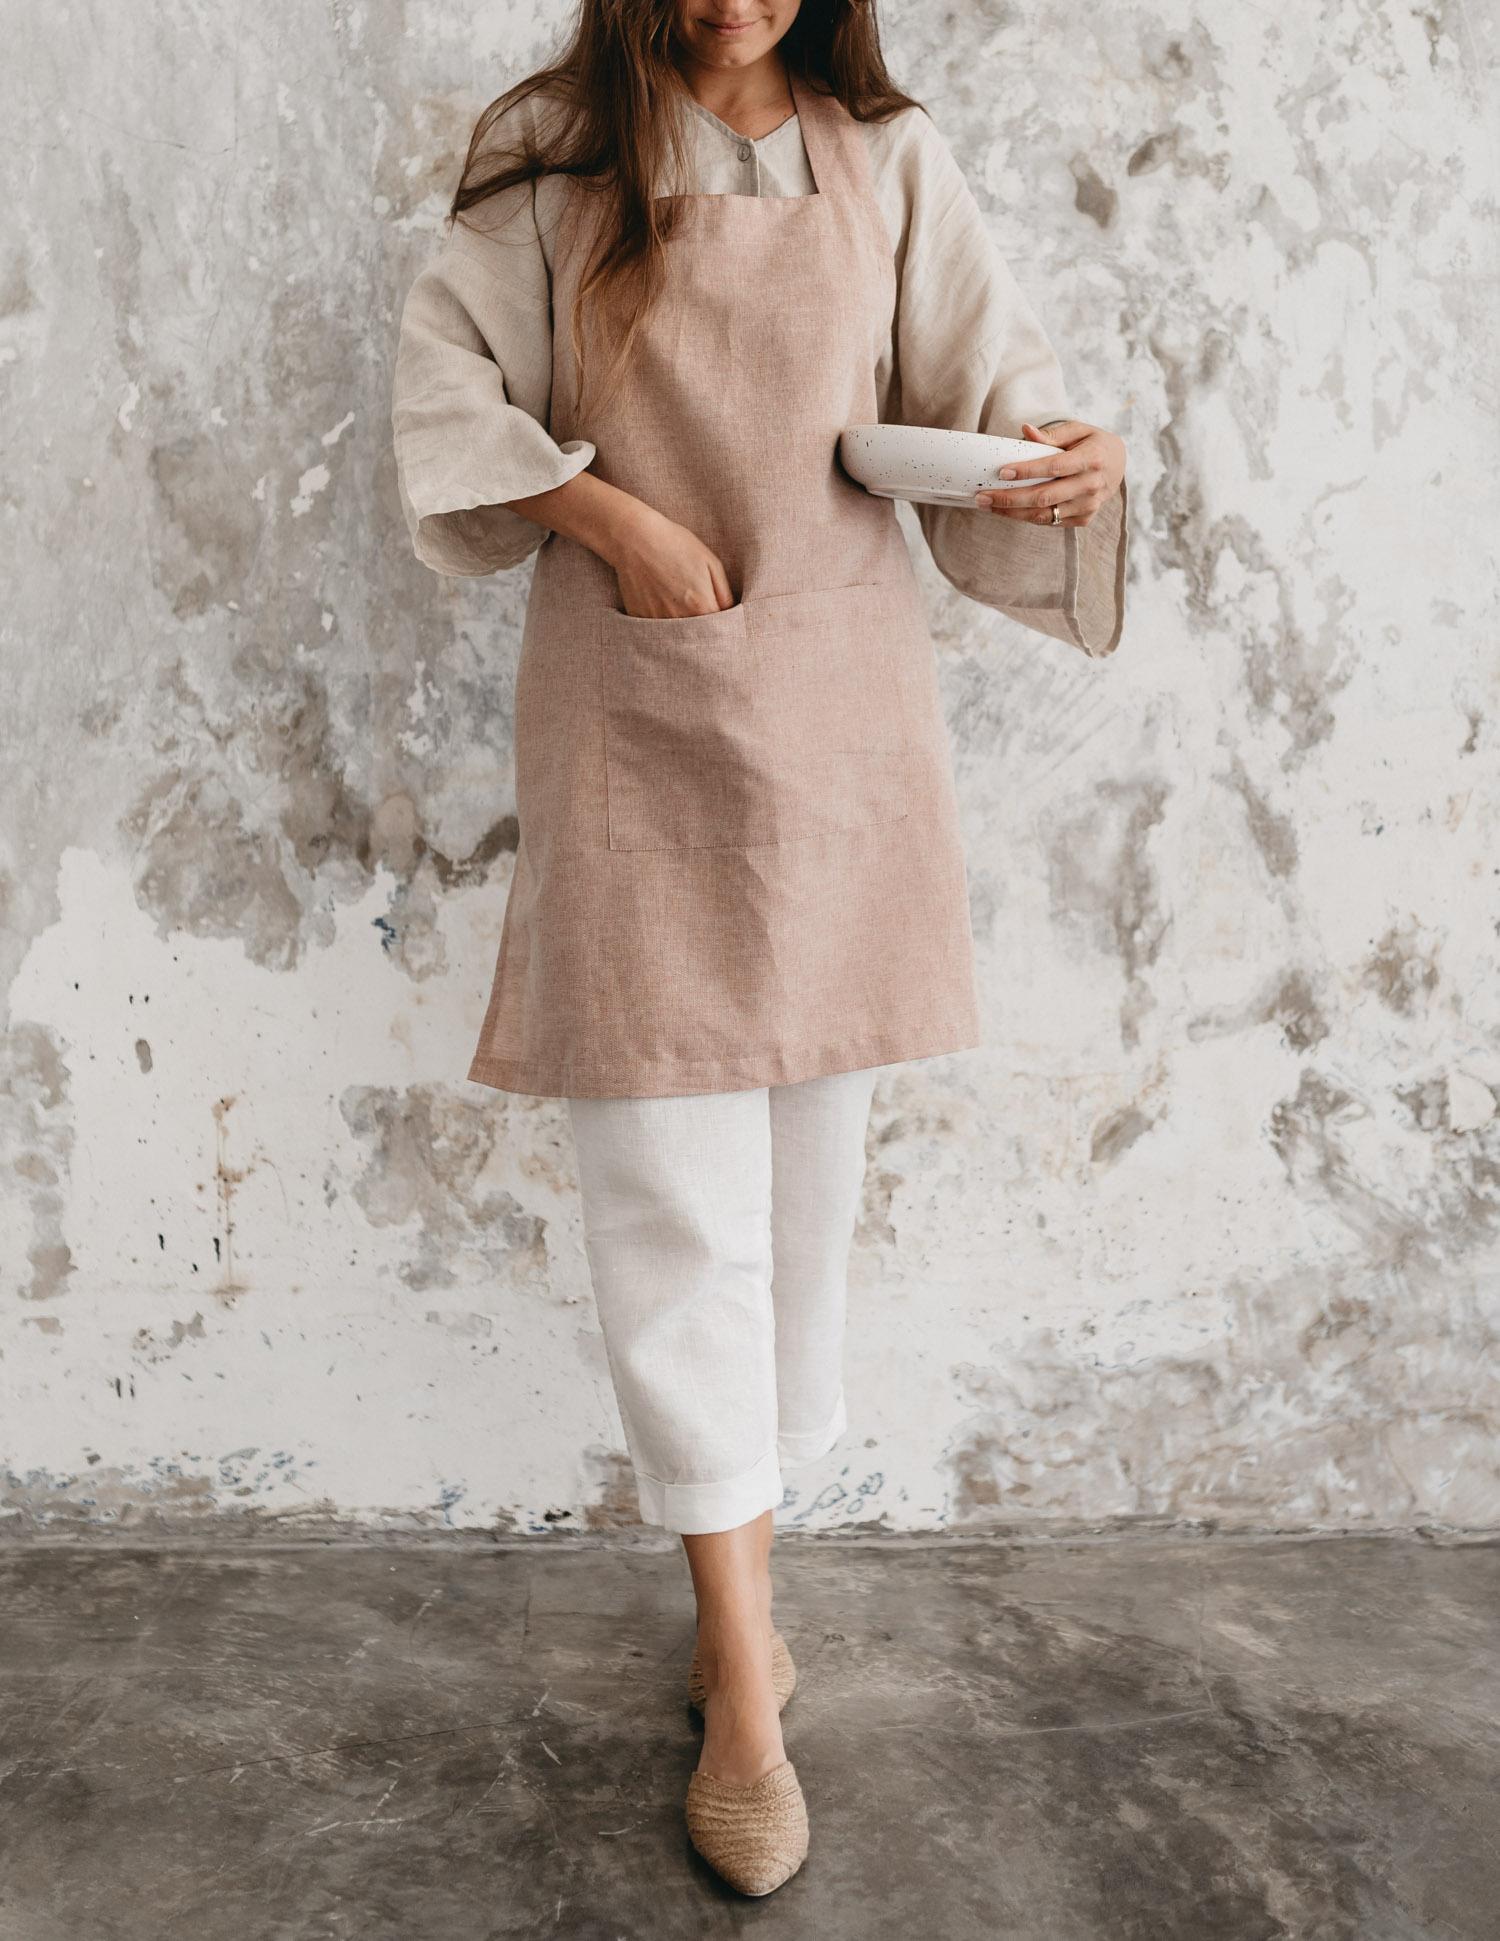 keira-mason-nowhere-and-everywhere-apron-linen-pockets.jpg